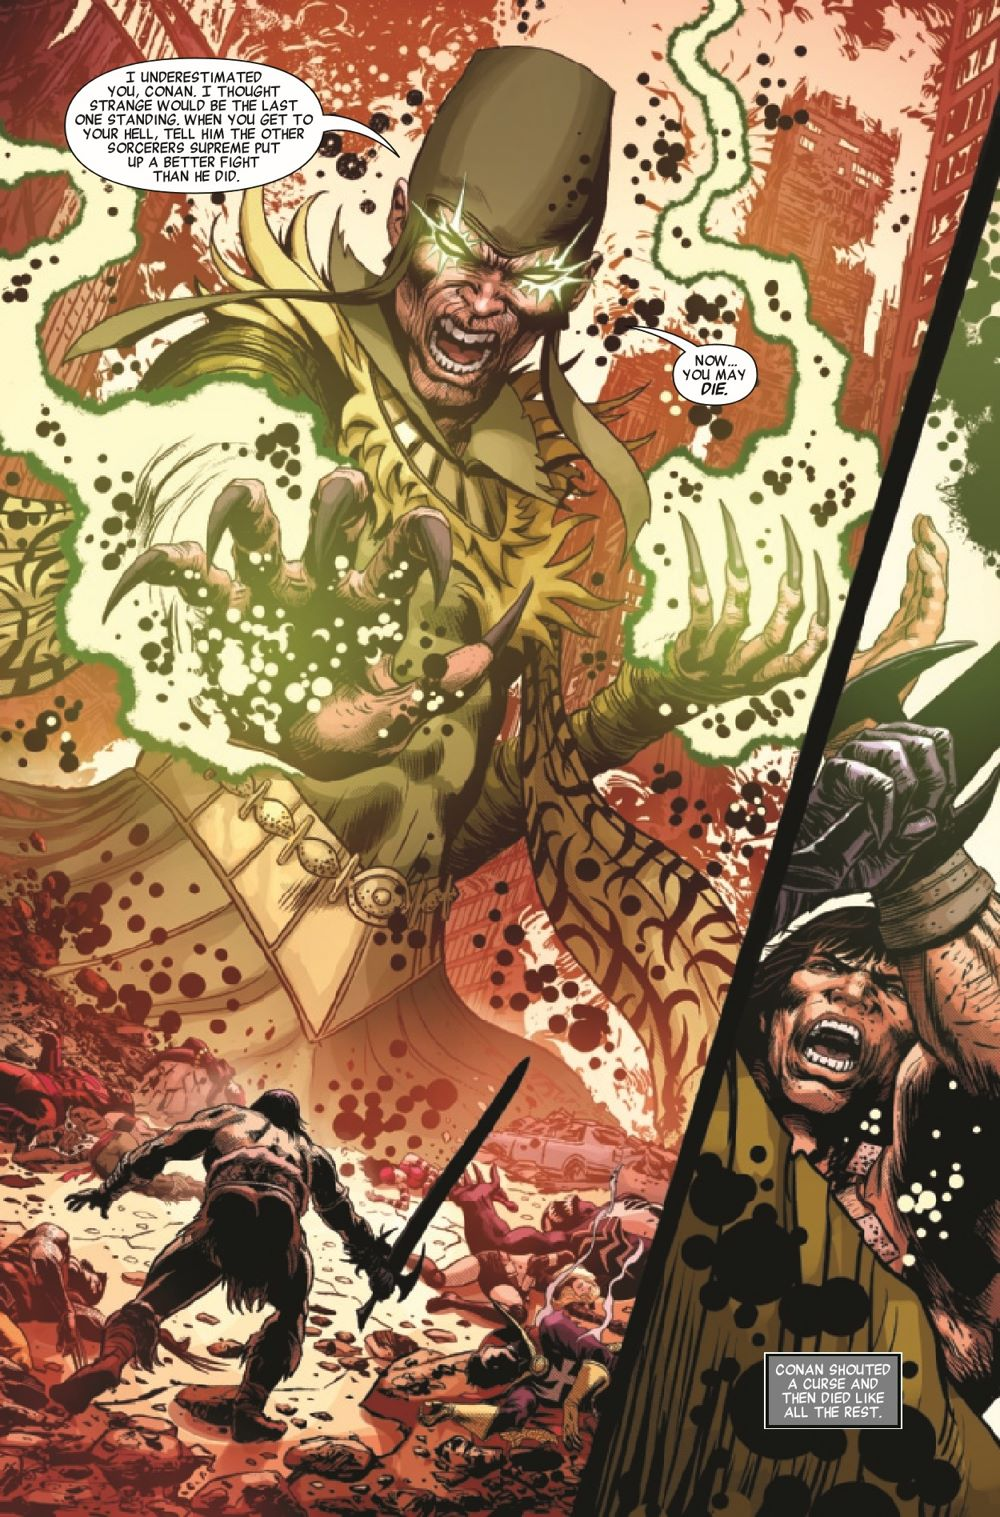 SAVAVEN2018021_Preview-3 ComicList Previews: SAVAGE AVENGERS #21